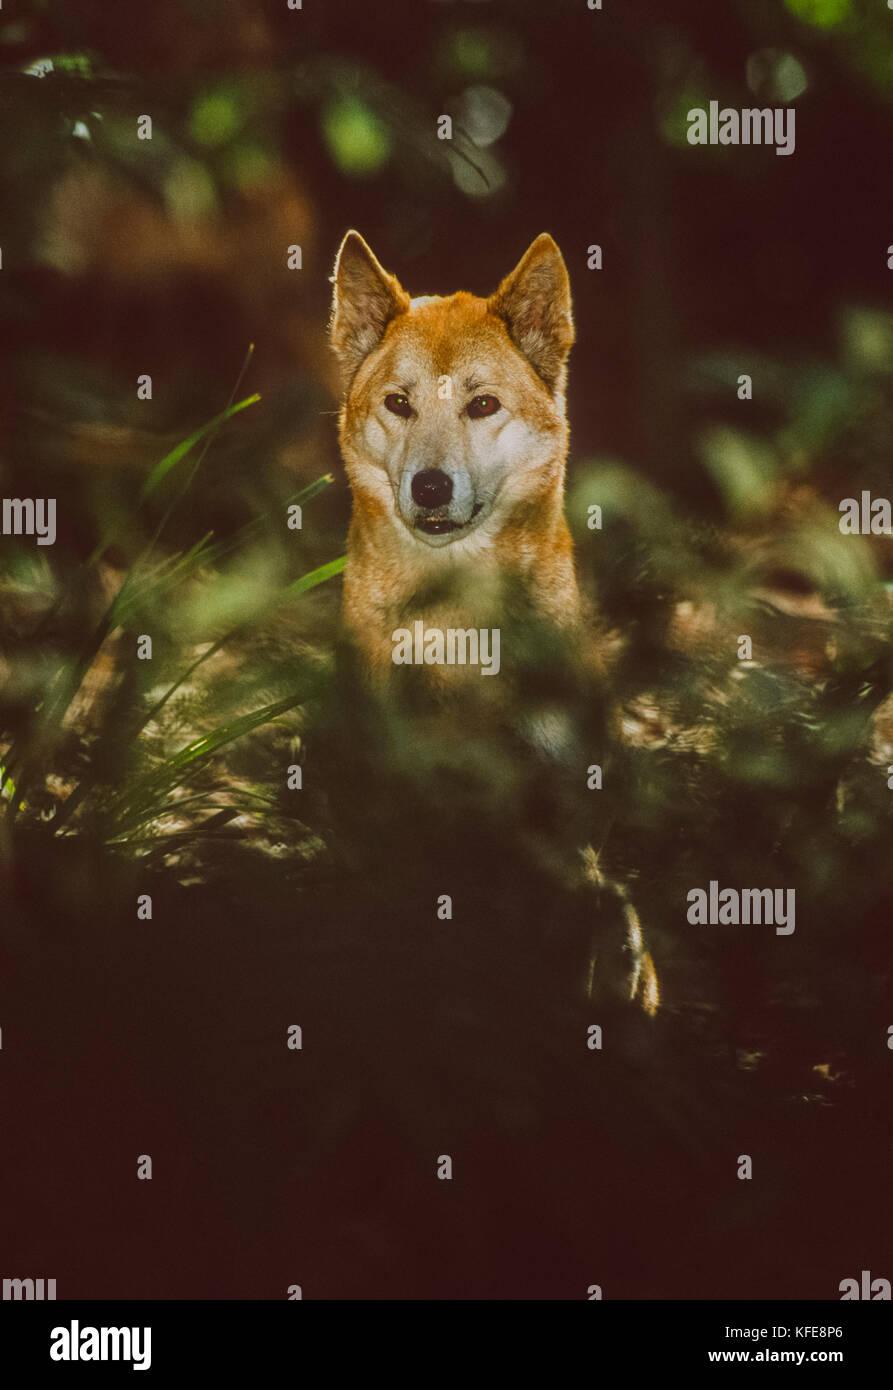 Australian Dingo, (Canis dingo or Canis lupus dingo), Fraser Island or K'gari Island, Queensland, Australia Stock Photo